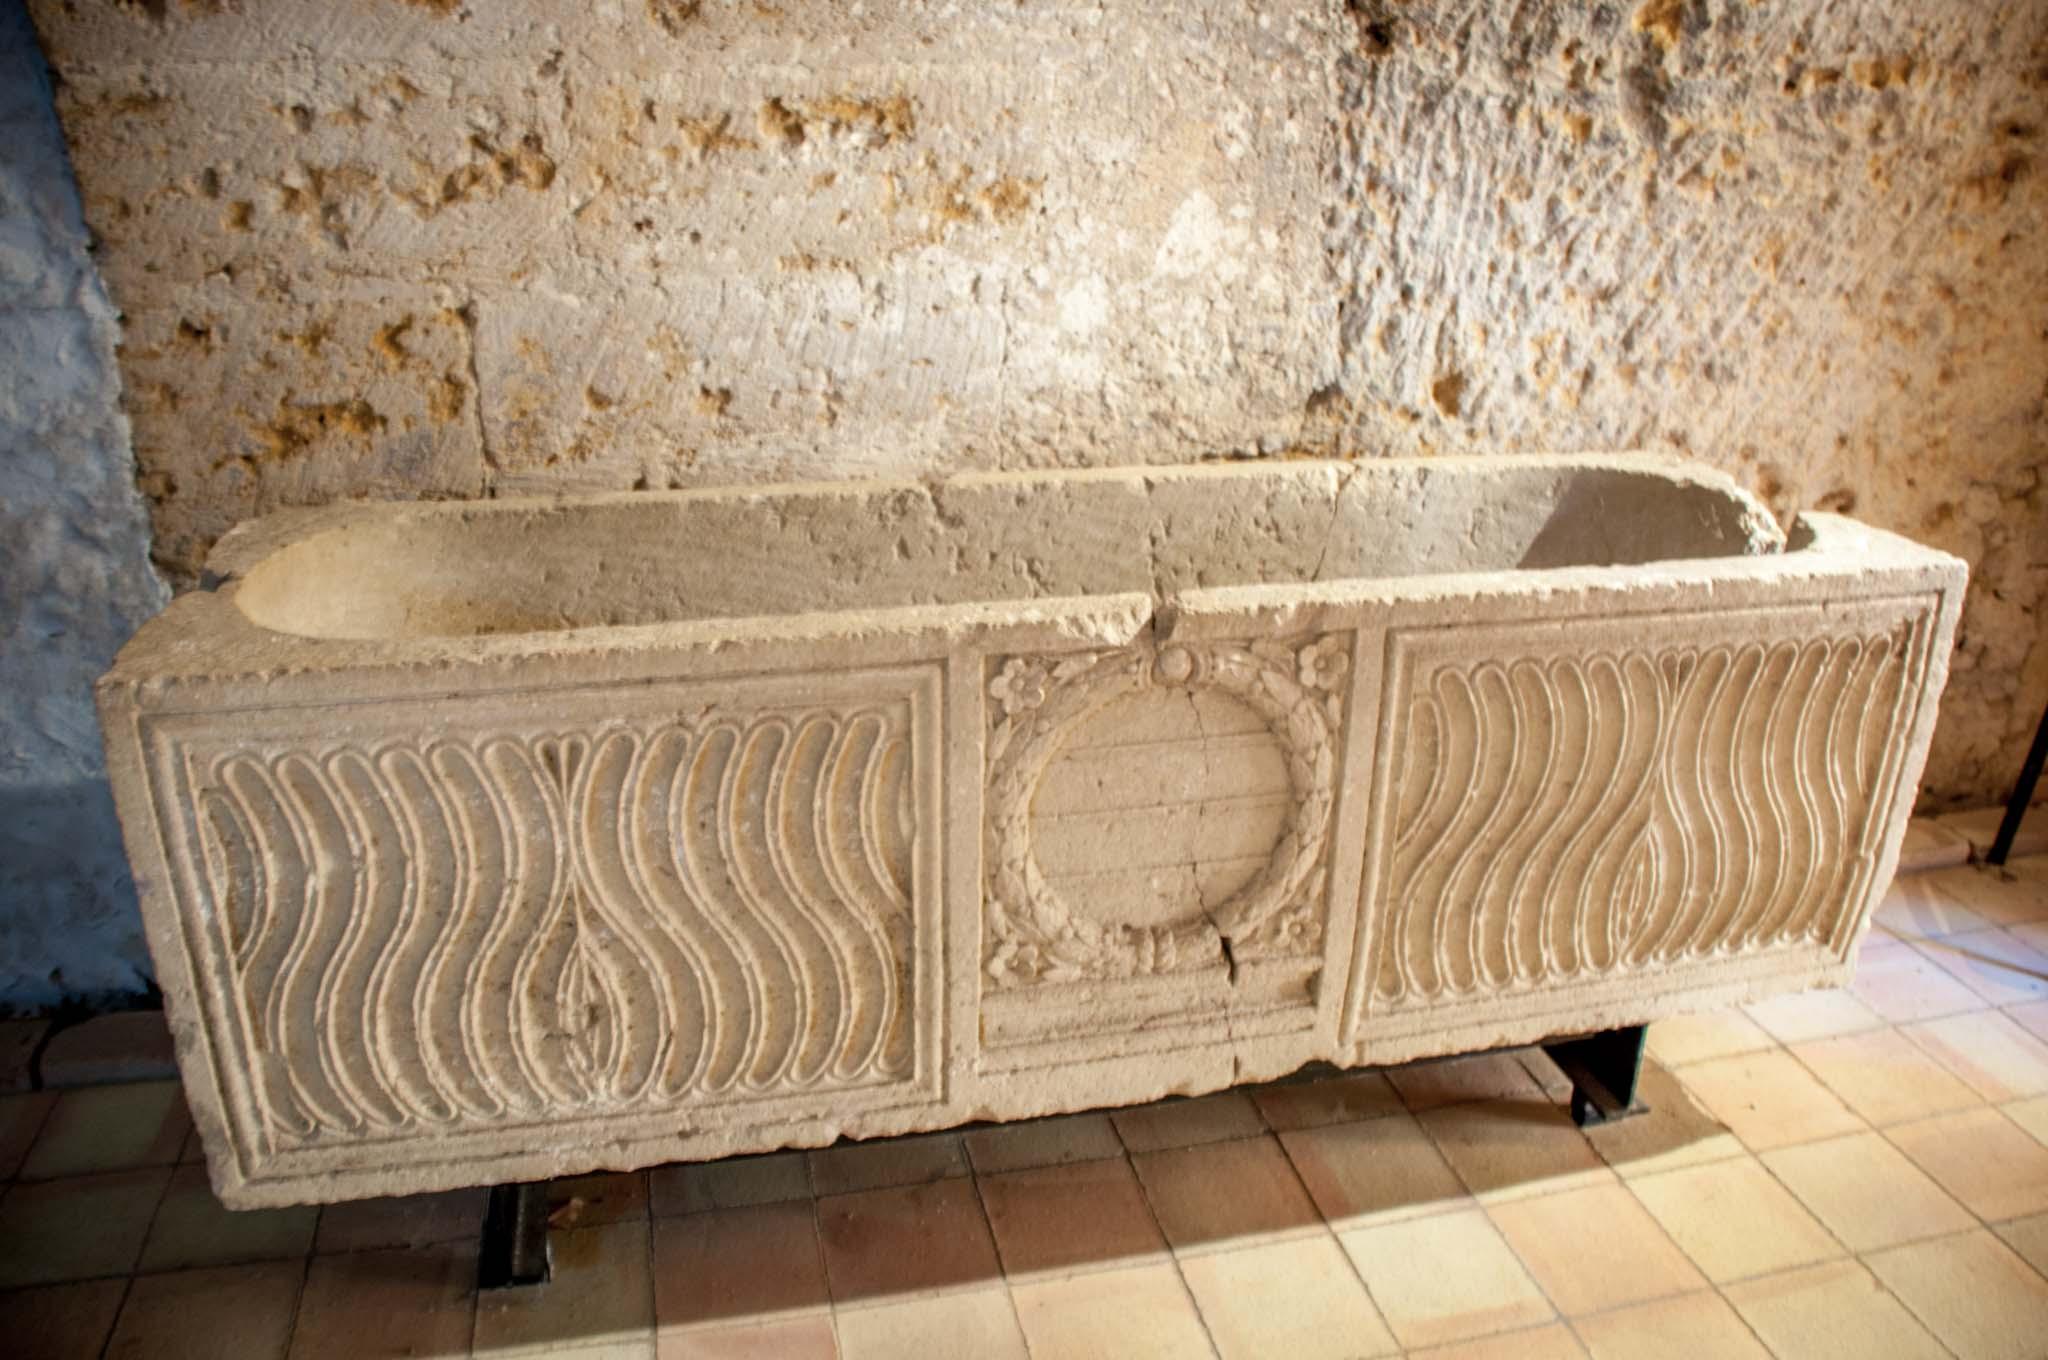 Ancient sarcophagus on display